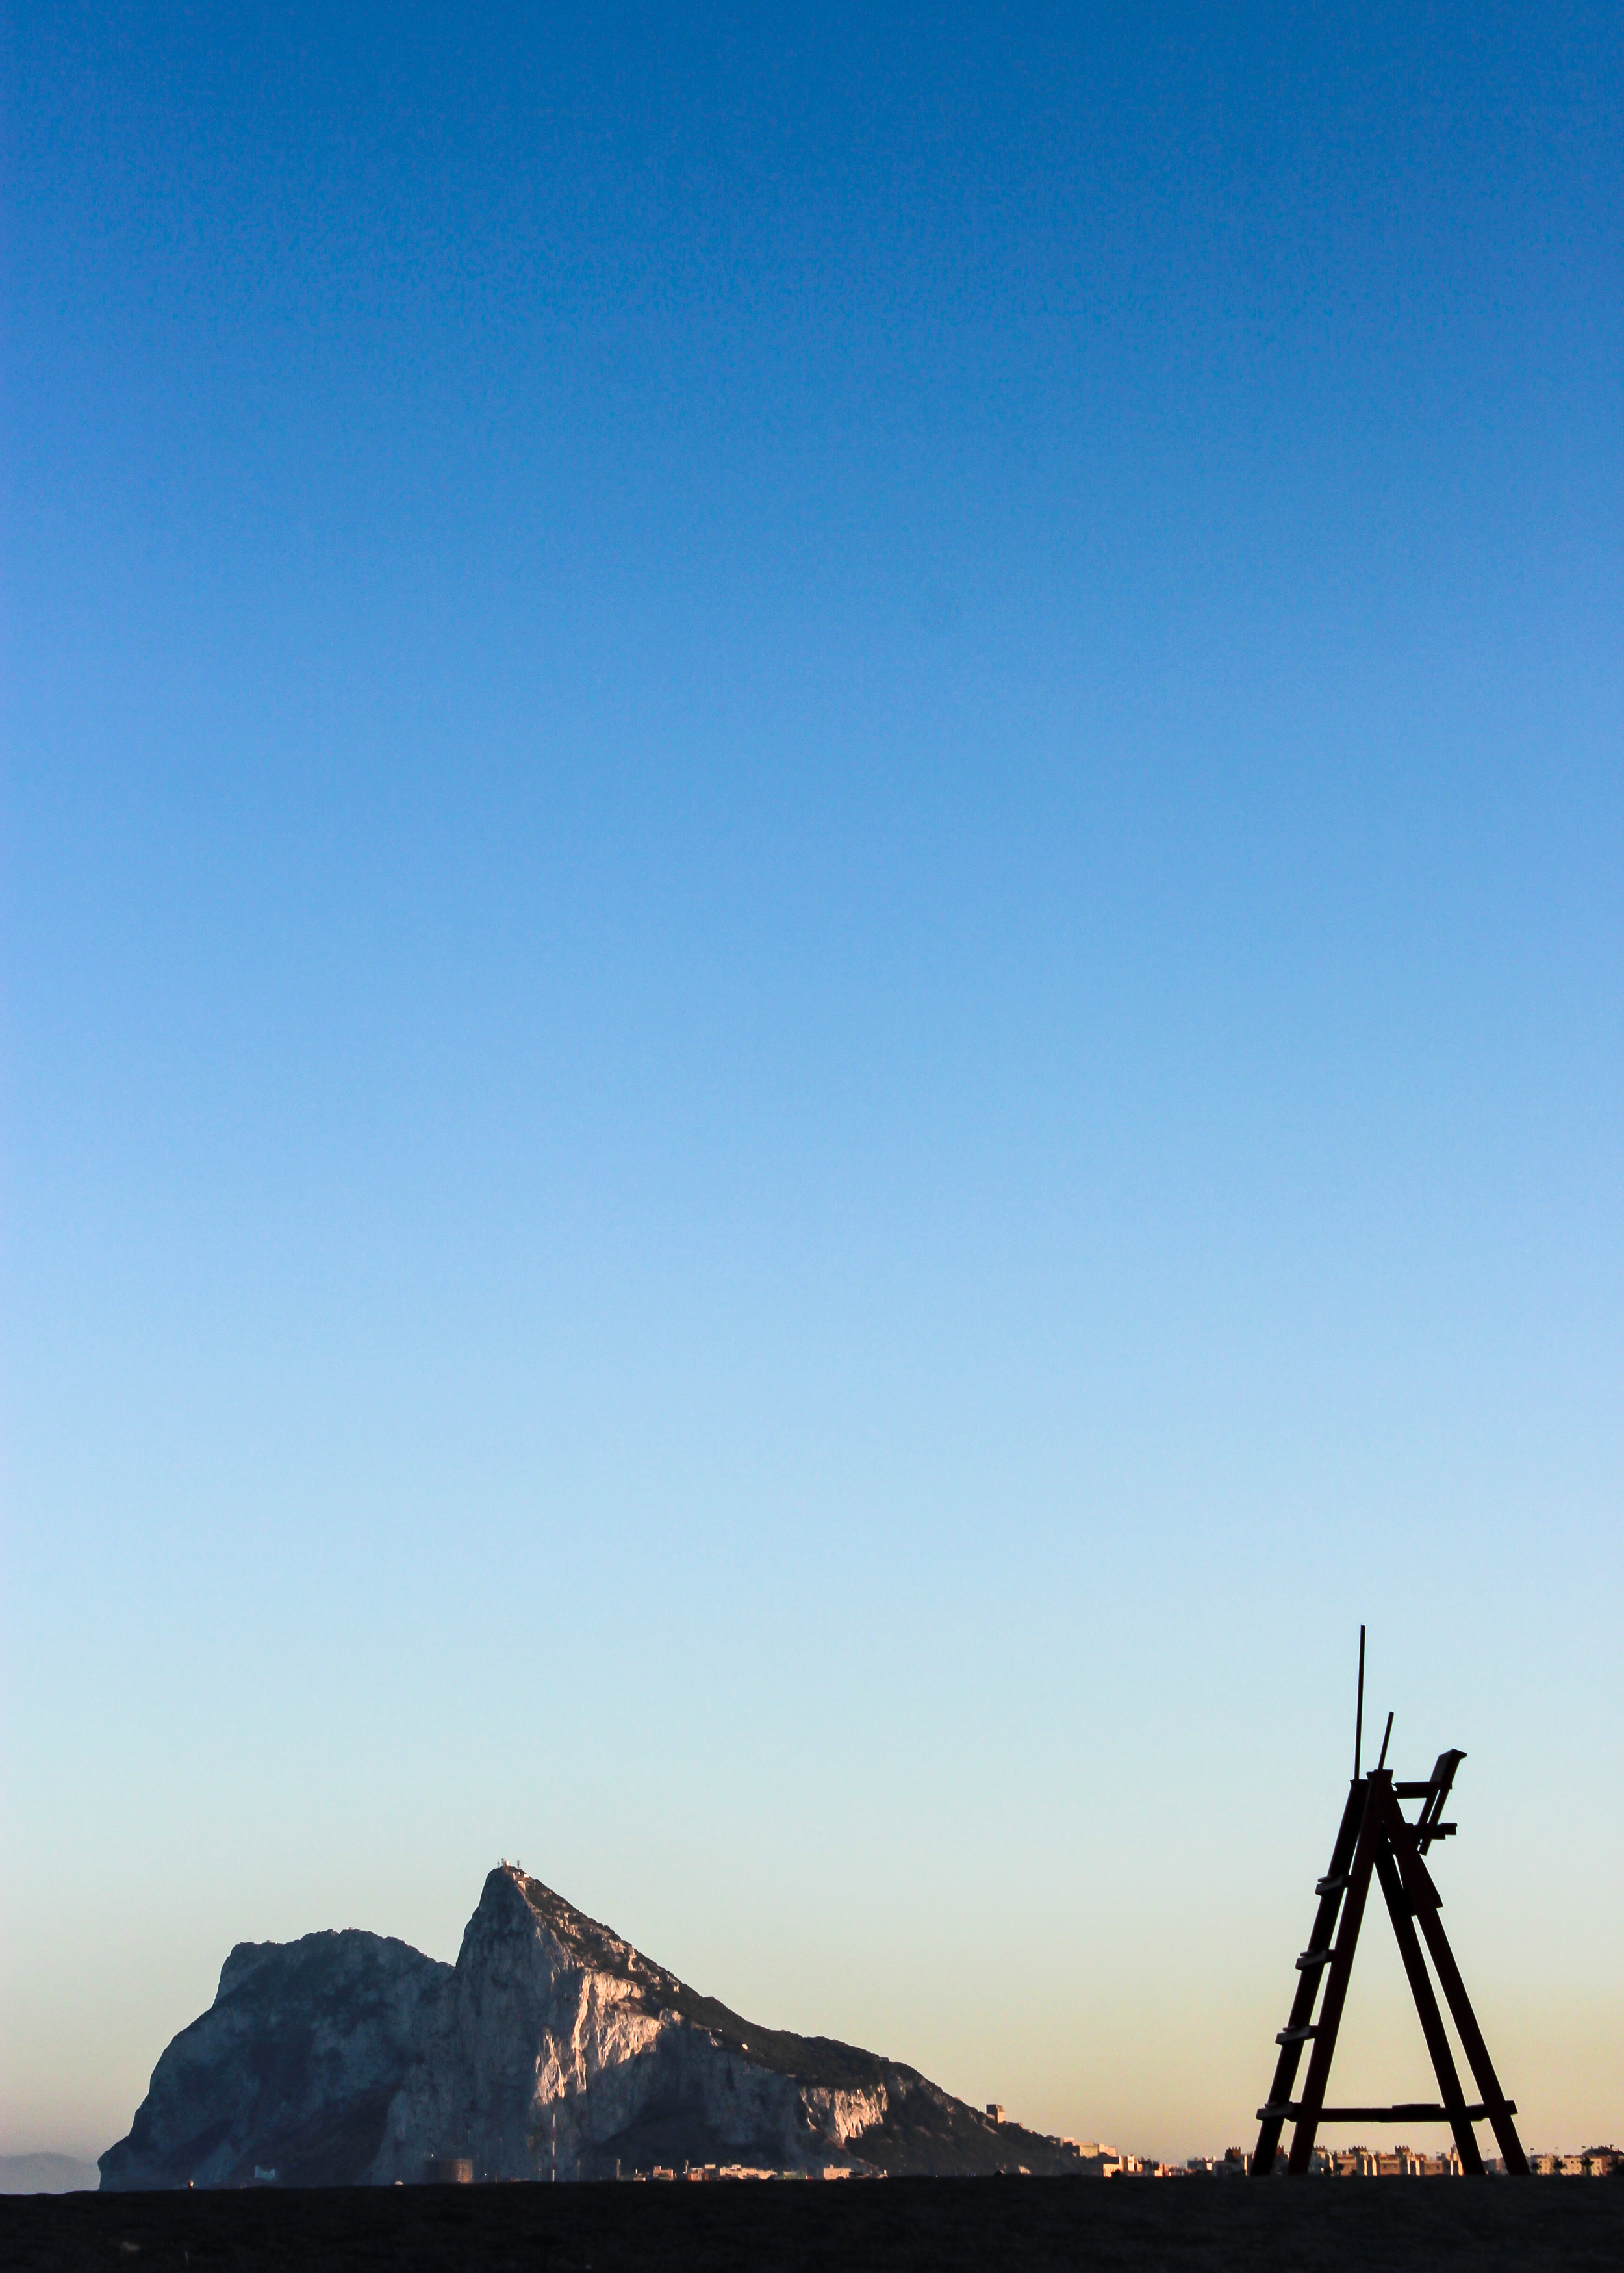 The Rock of Gibraltar. Santa Margarita, La Linea de la Concepcion, Mediterranean Sea ,  Andalusia, Spain, Europe | www.DoLessGetMoreDone.com |